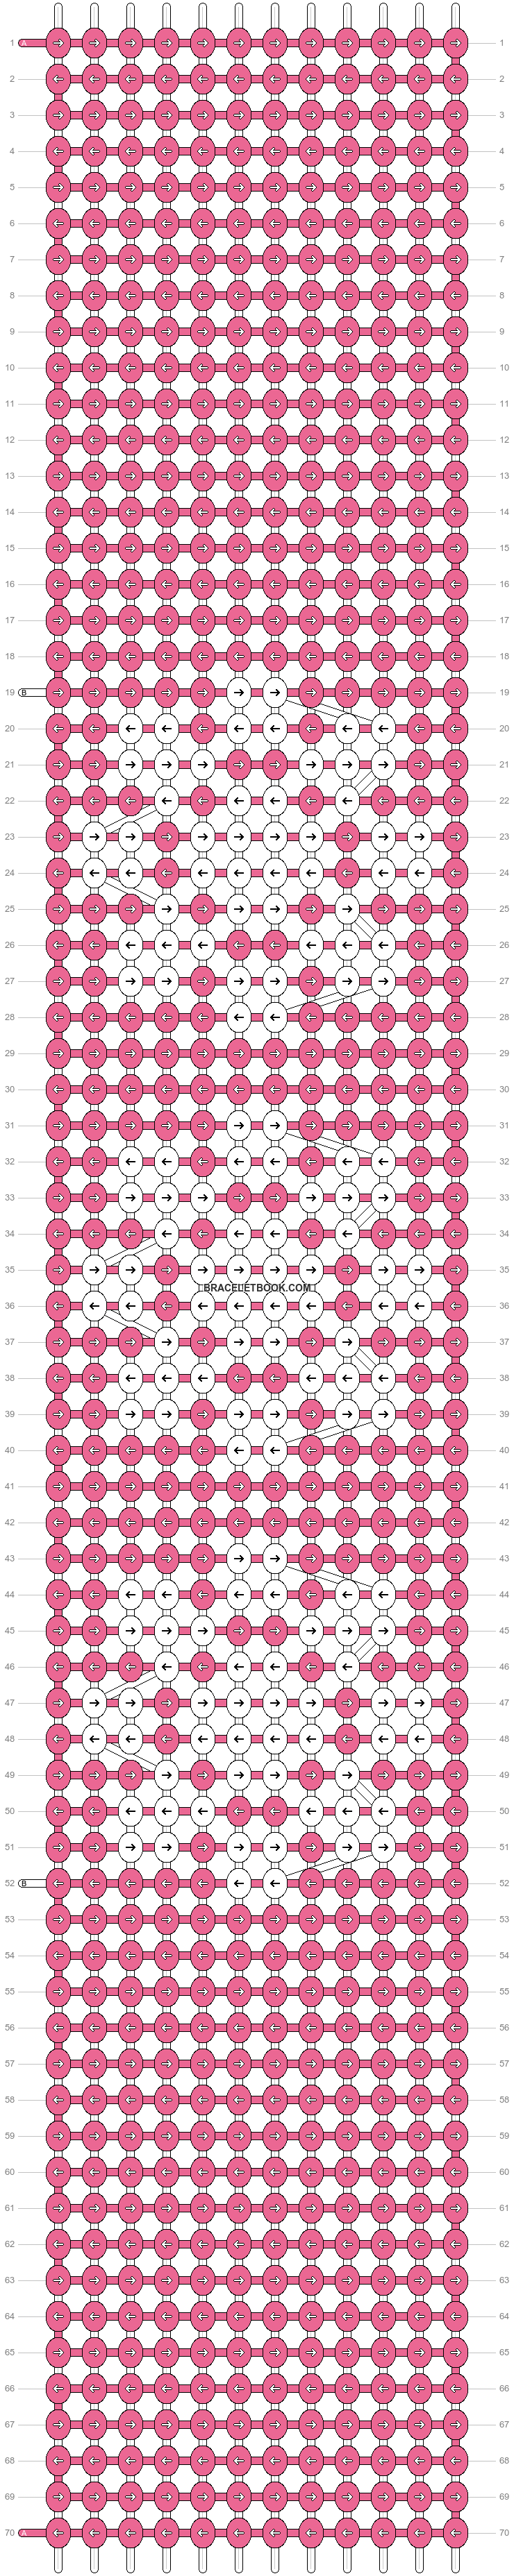 Alpha pattern #80294 pattern